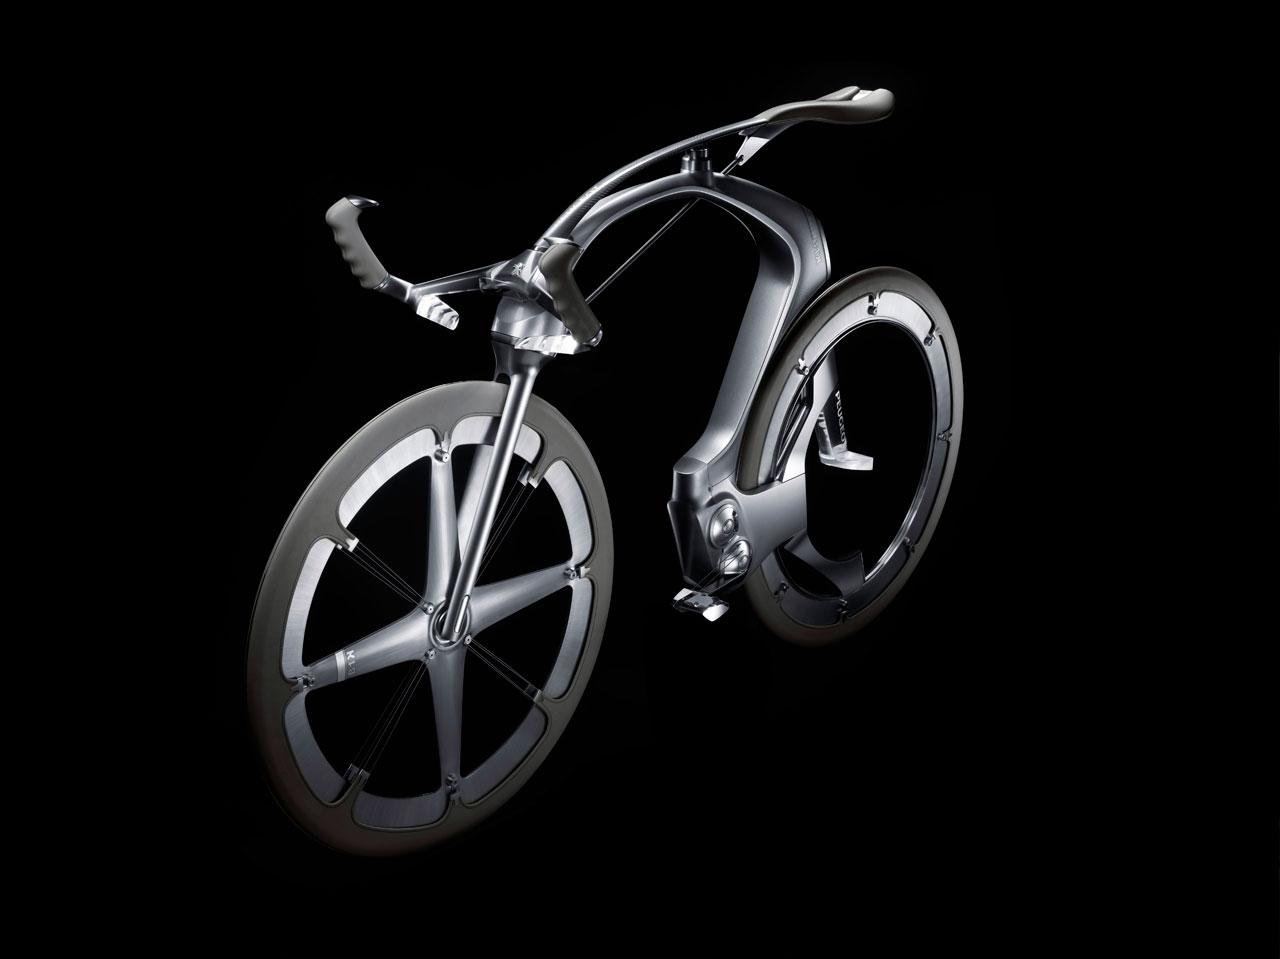 http://www.carbodydesign.com/archive/2010/02/peugeot-b1k-bike-concept/Peugeot-B1K-Bike-Concept-2-lg.jpg